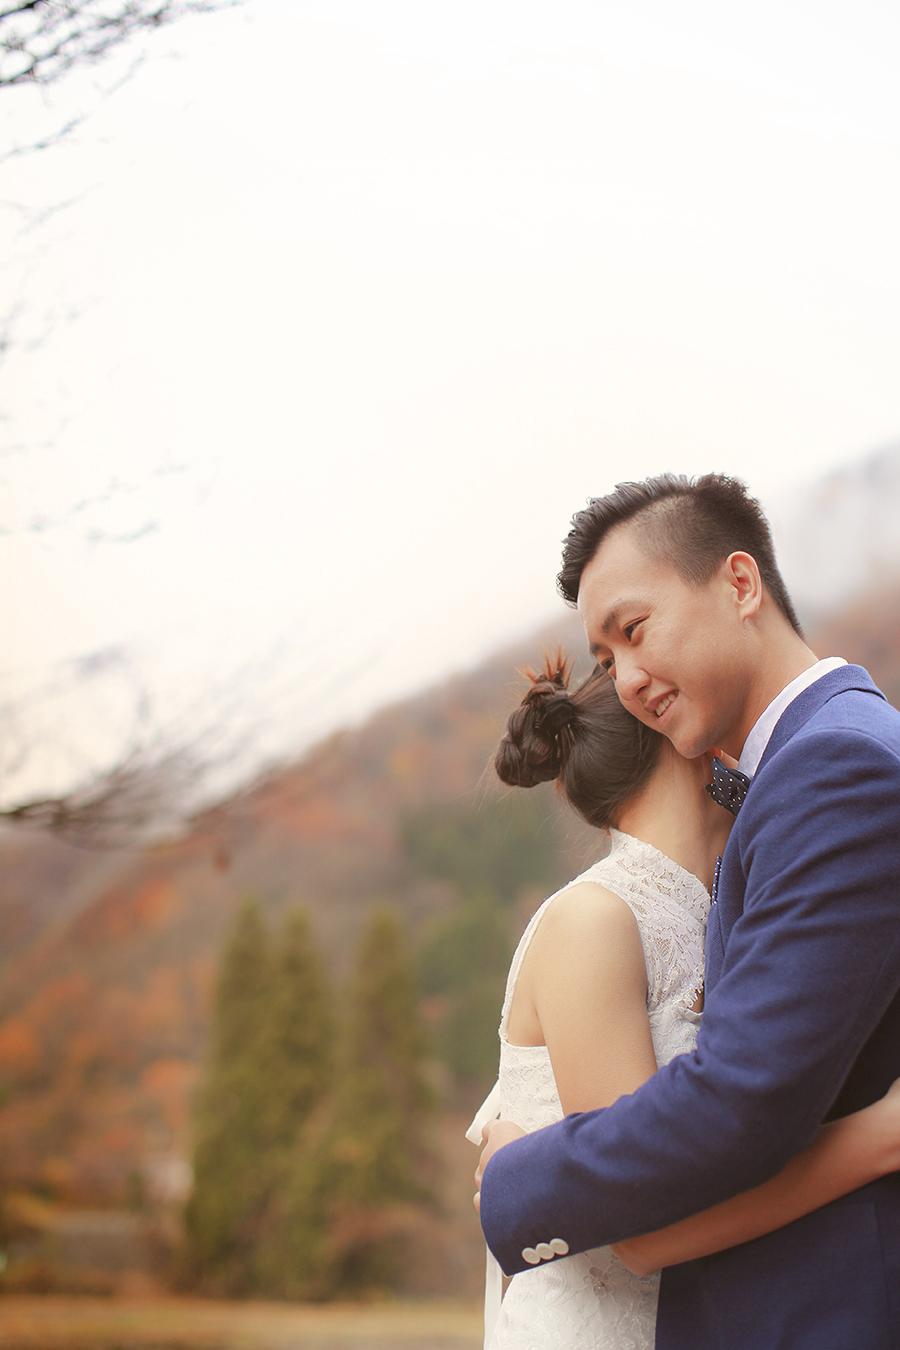 shirakawago japan . pre-wedding photography by kurt ahs . terry+zoey . 4256.jpg